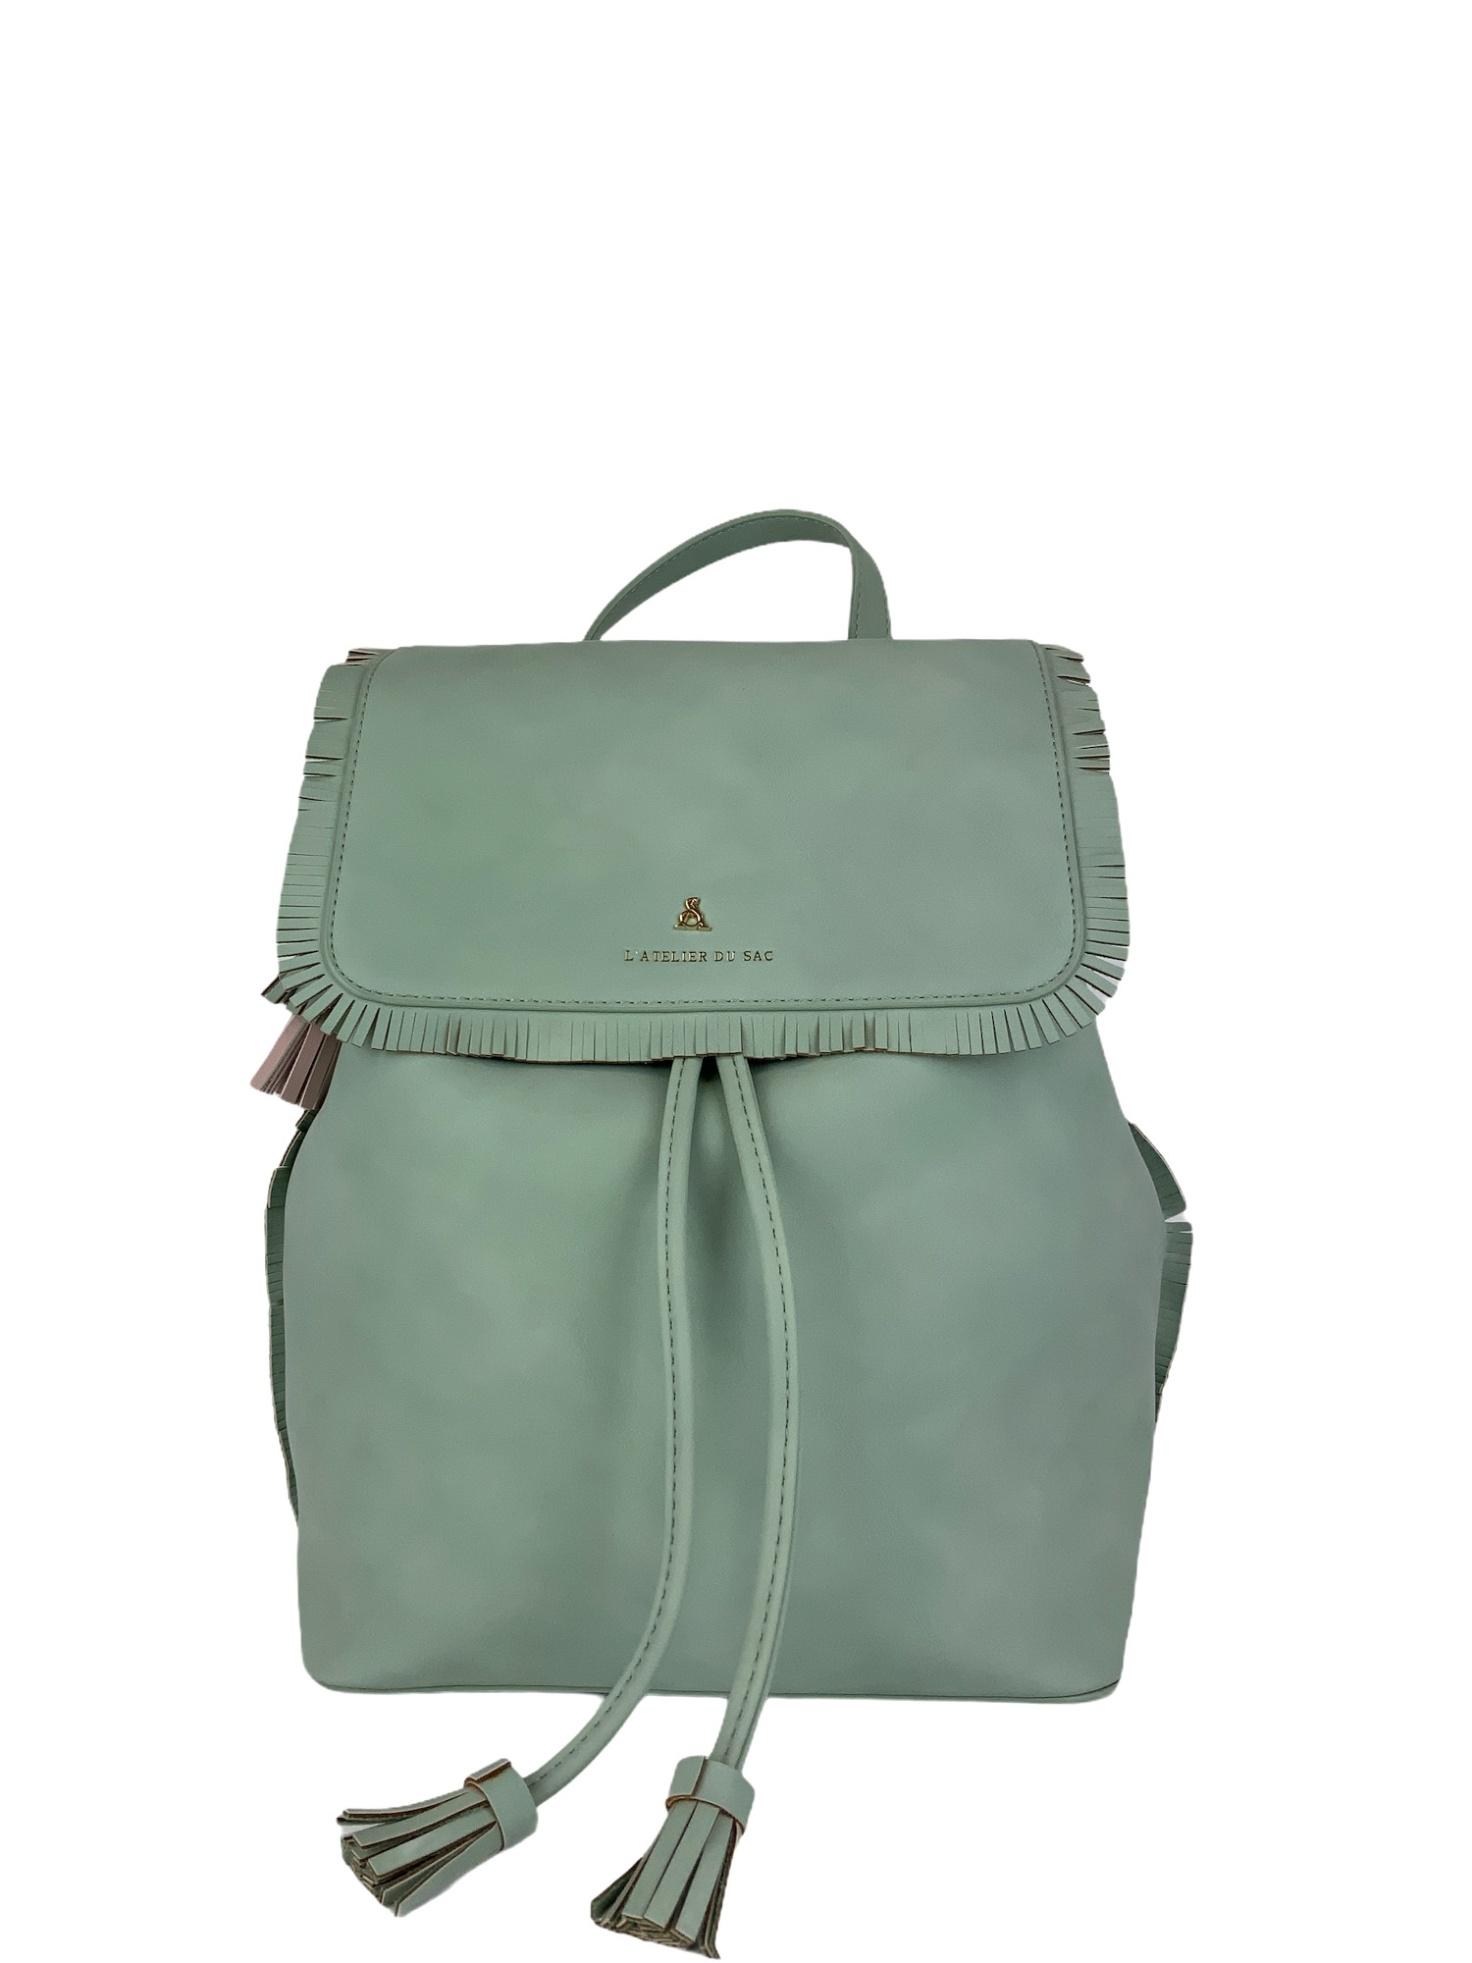 Zaino Pash Bag Atelier Du sac 10844 Verde Pastello